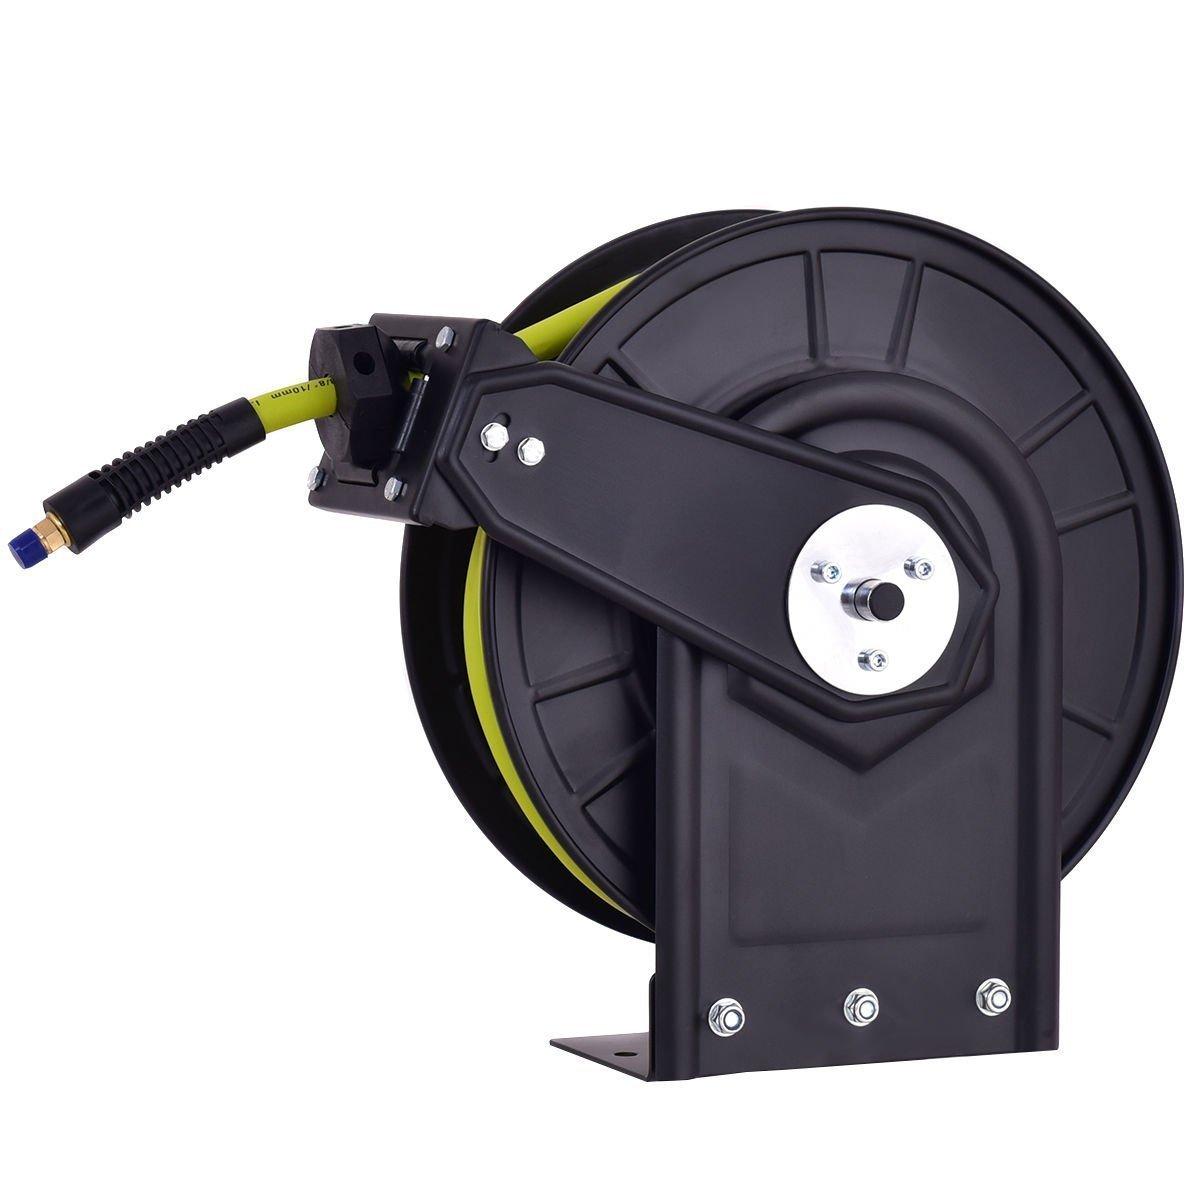 Goplus Air Hose Reel Auto Rewind Steel Compressor Hose w/ Retractable 3/8'' x 50' Rubber Hose, Max.300 PSI